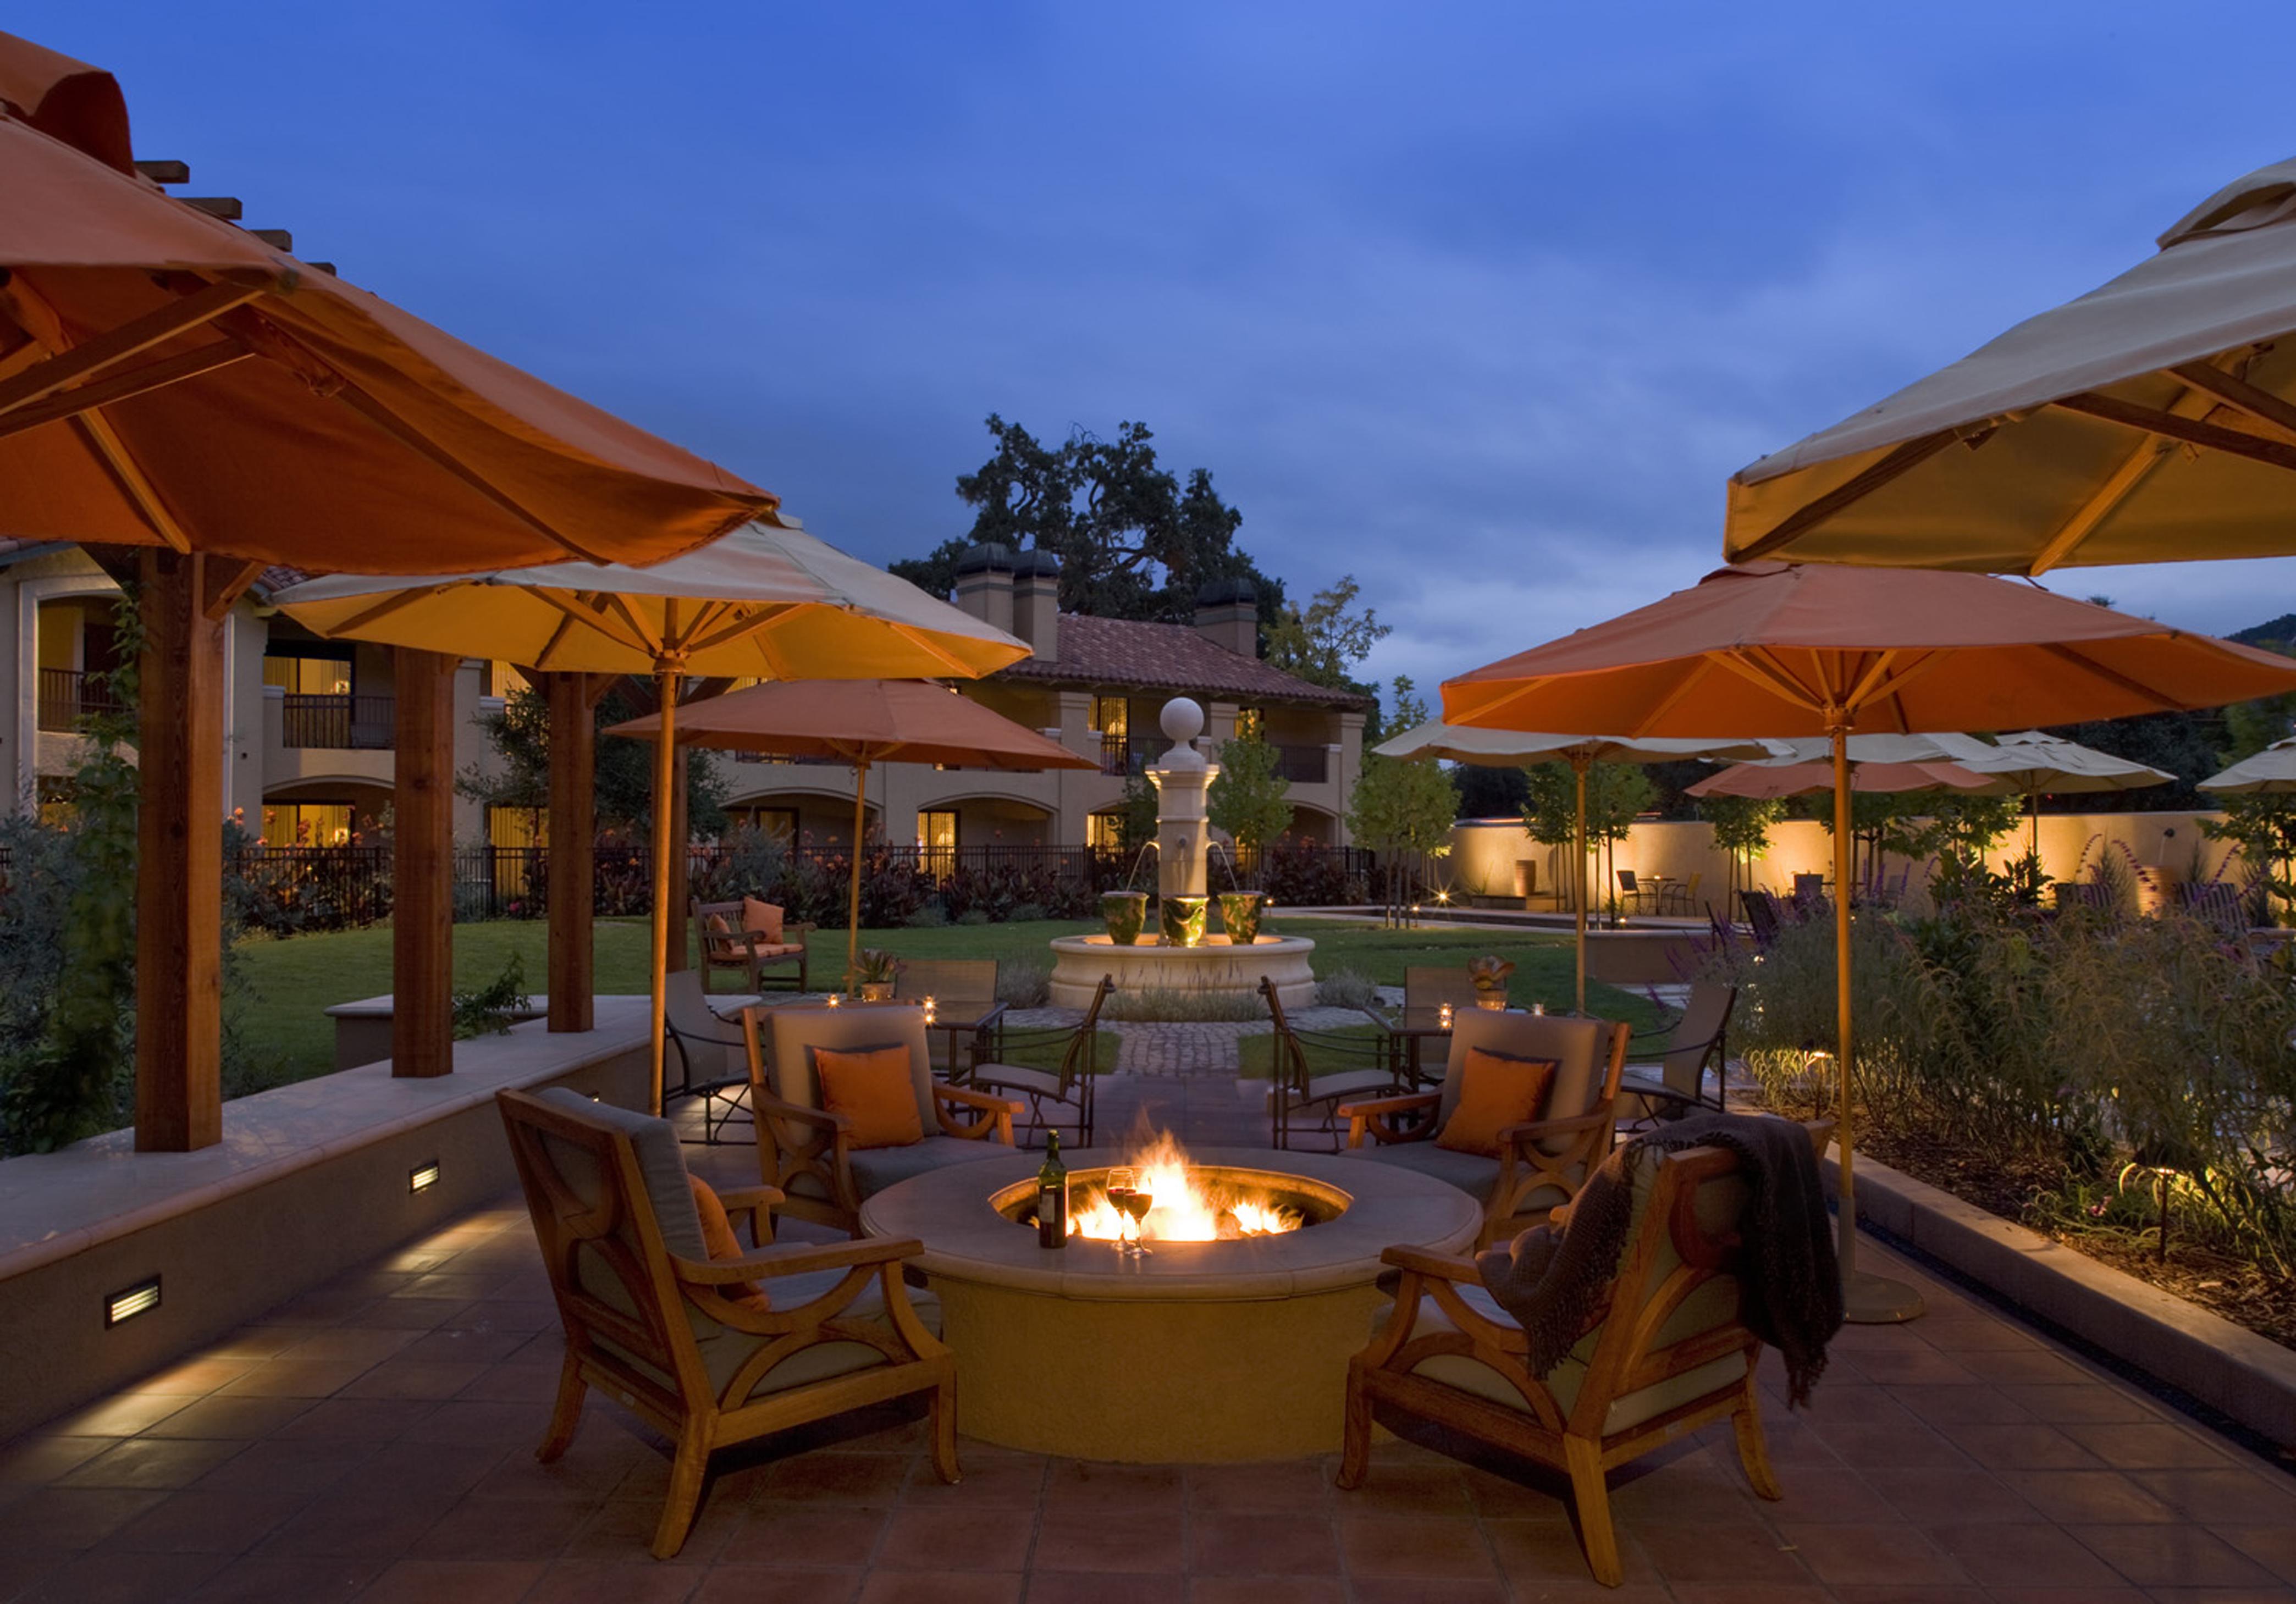 Napa Valley Hotels >> Napa Valley Lodge Yountville Ca 94599